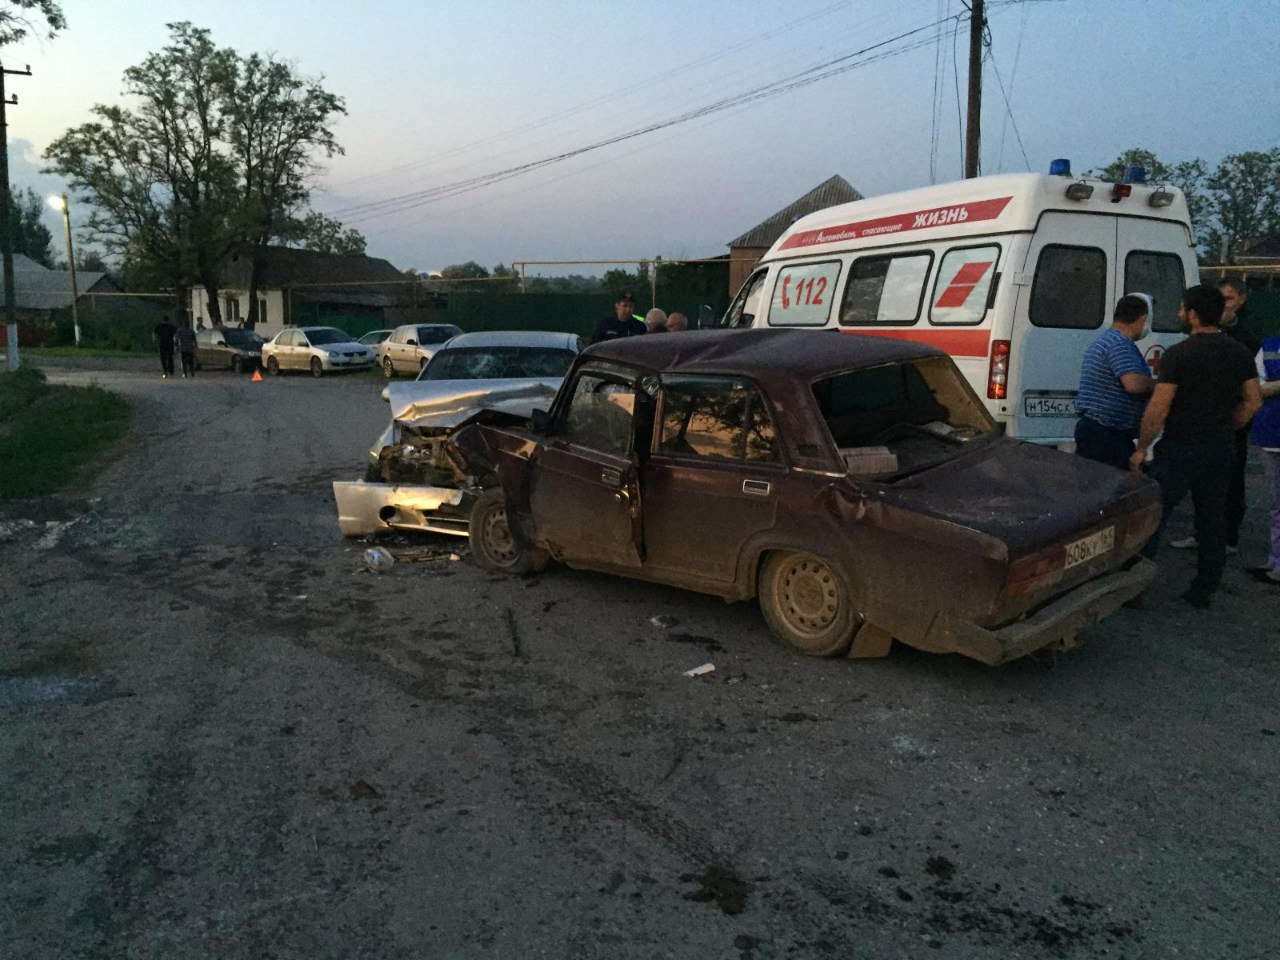 Недалеко от Таганрога лоб в лоб столкнулись «ВАЗ-21074» и KIA Spectra